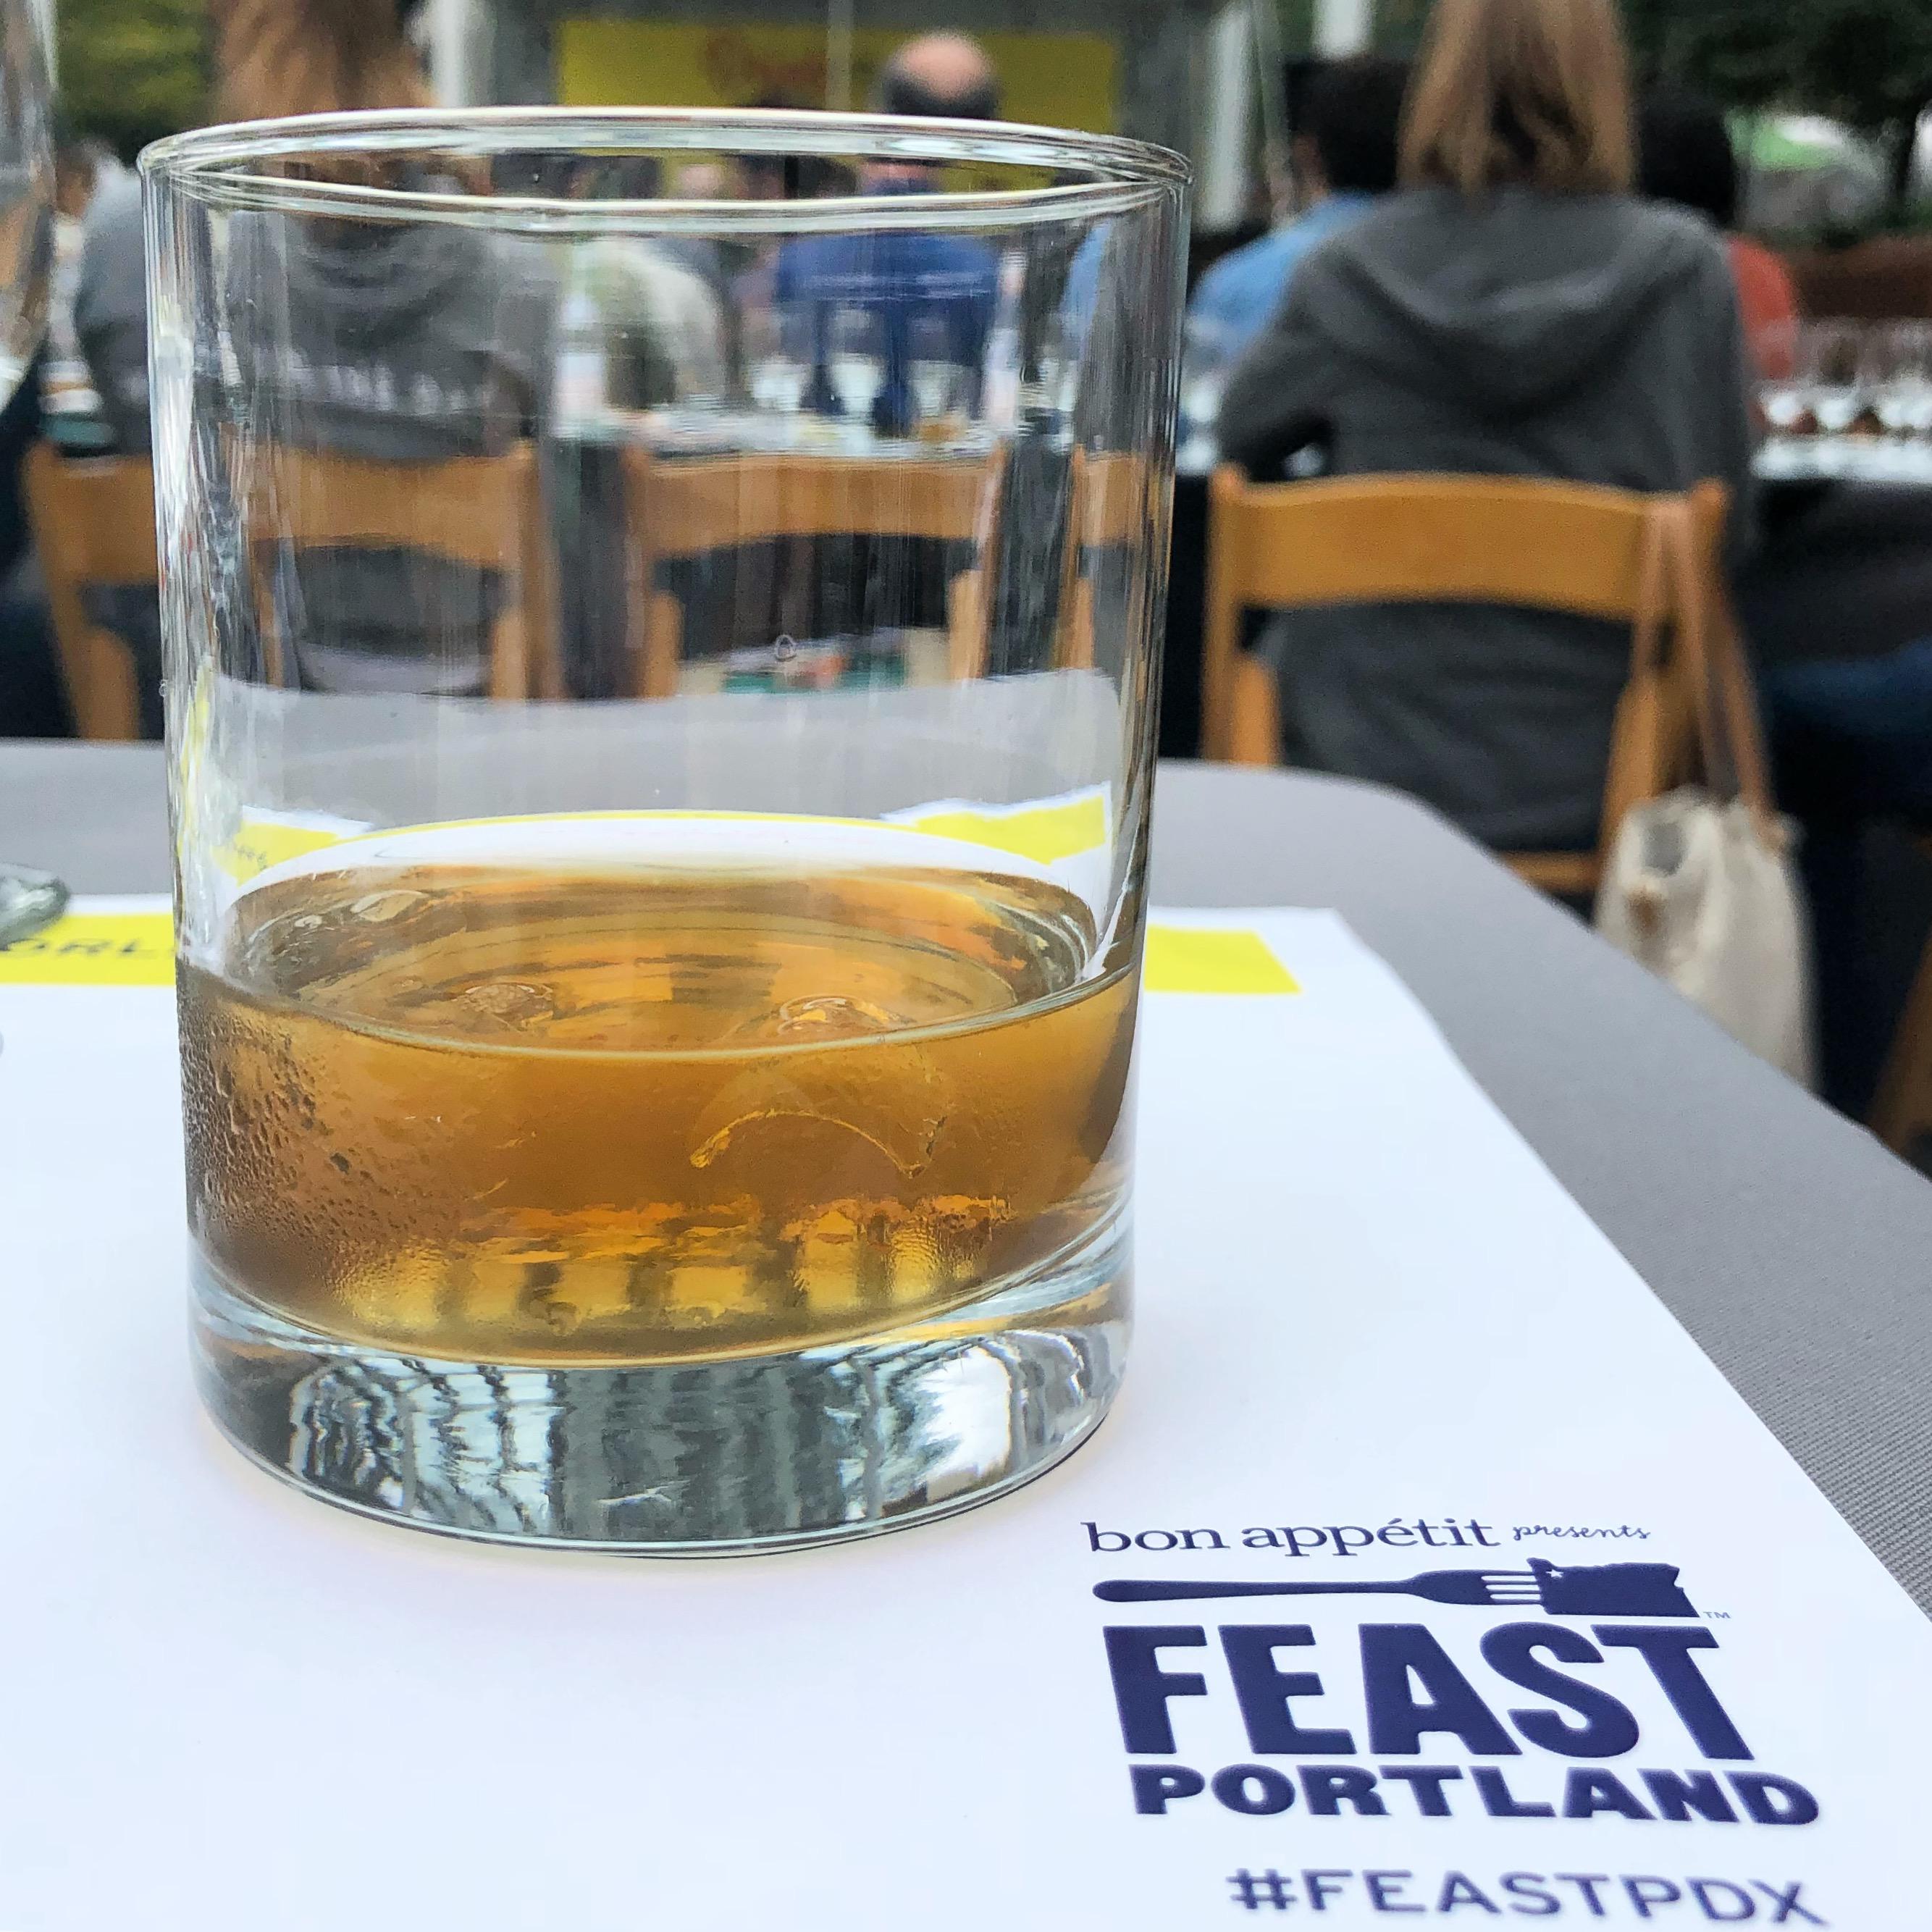 A mezcal at Drink Tank during Feast Portland 2018.